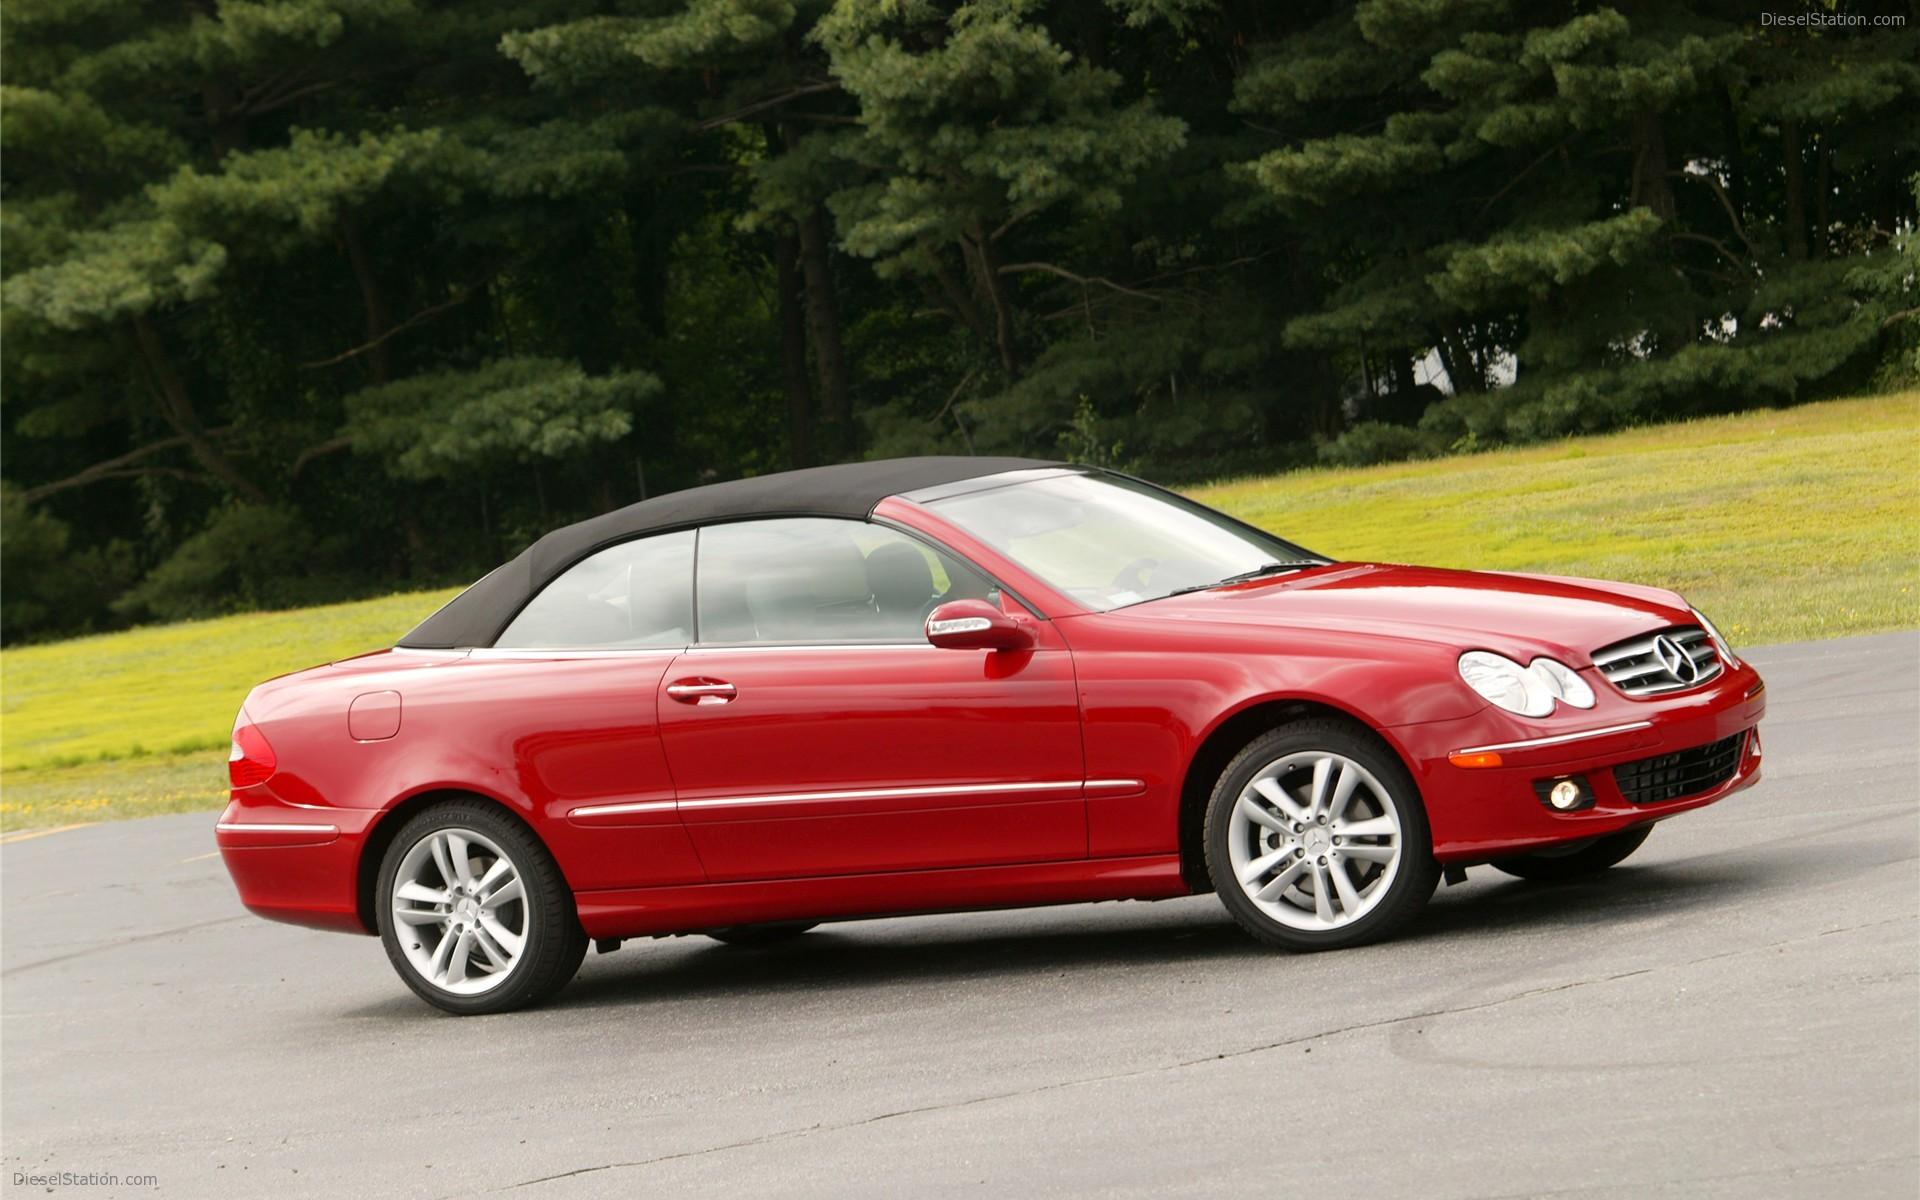 Mercedes benz clk 350 photos reviews news specs buy car for Buy my mercedes benz